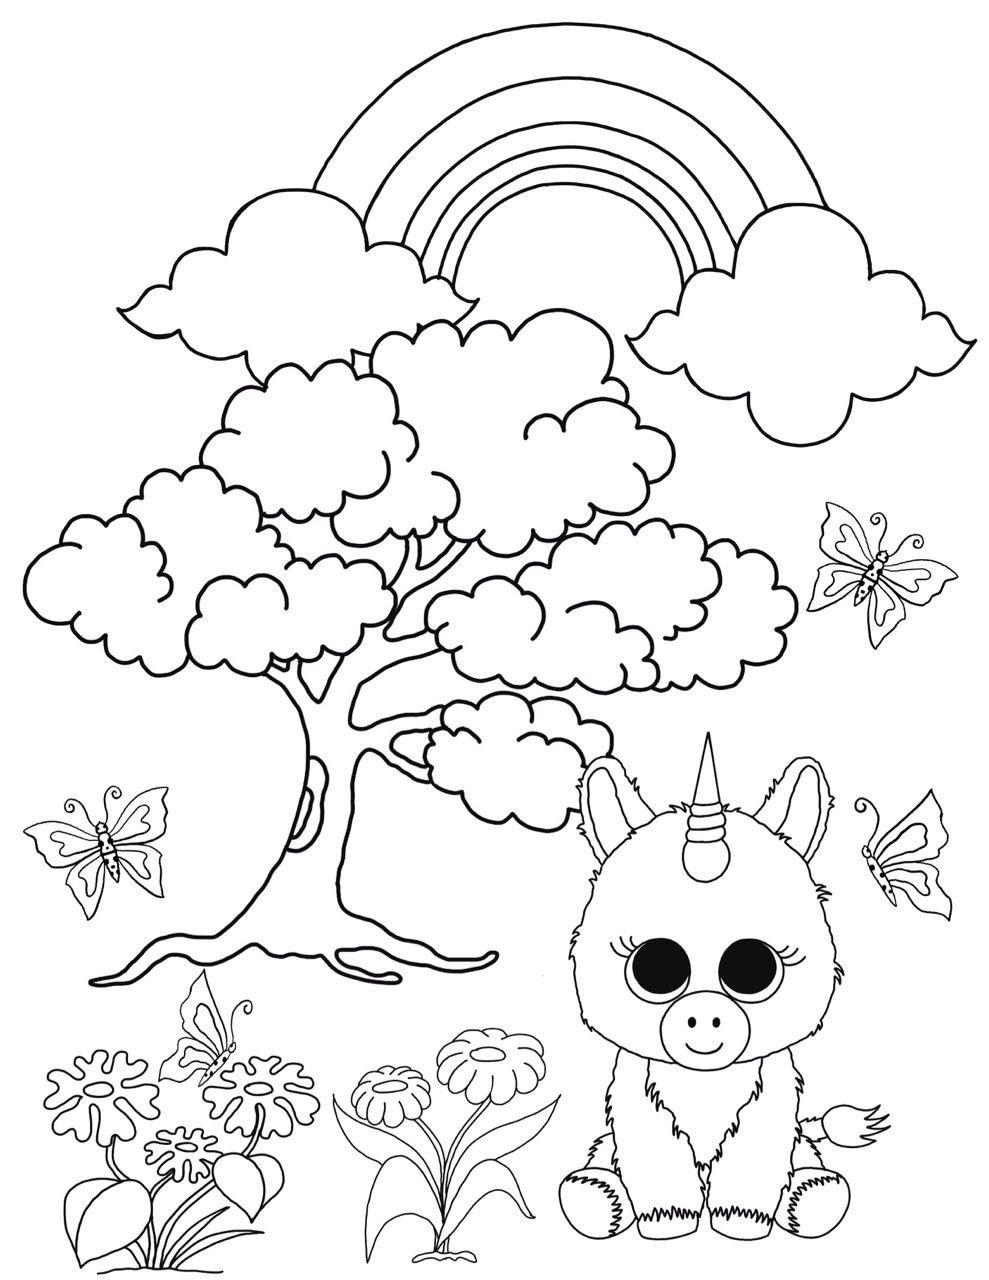 Pug Unicorn Coloring Page Youngandtae Com Unicorn Coloring Pages Monkey Coloring Pages Ladybug Coloring Page